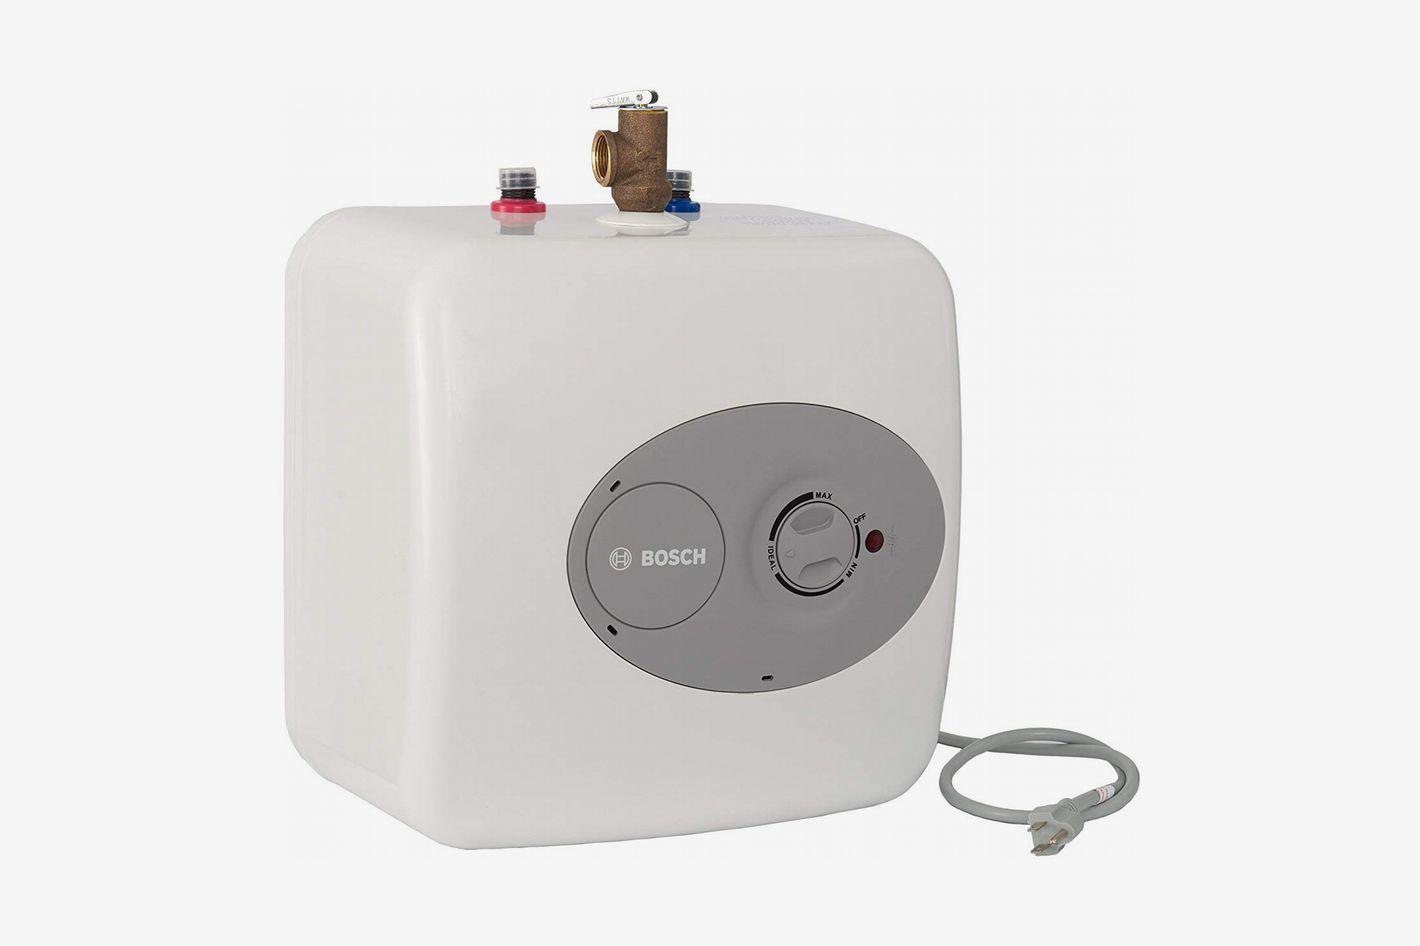 Bosch Tronic 3000 T 4-Gallon Electric Mini-Tank Water Heater